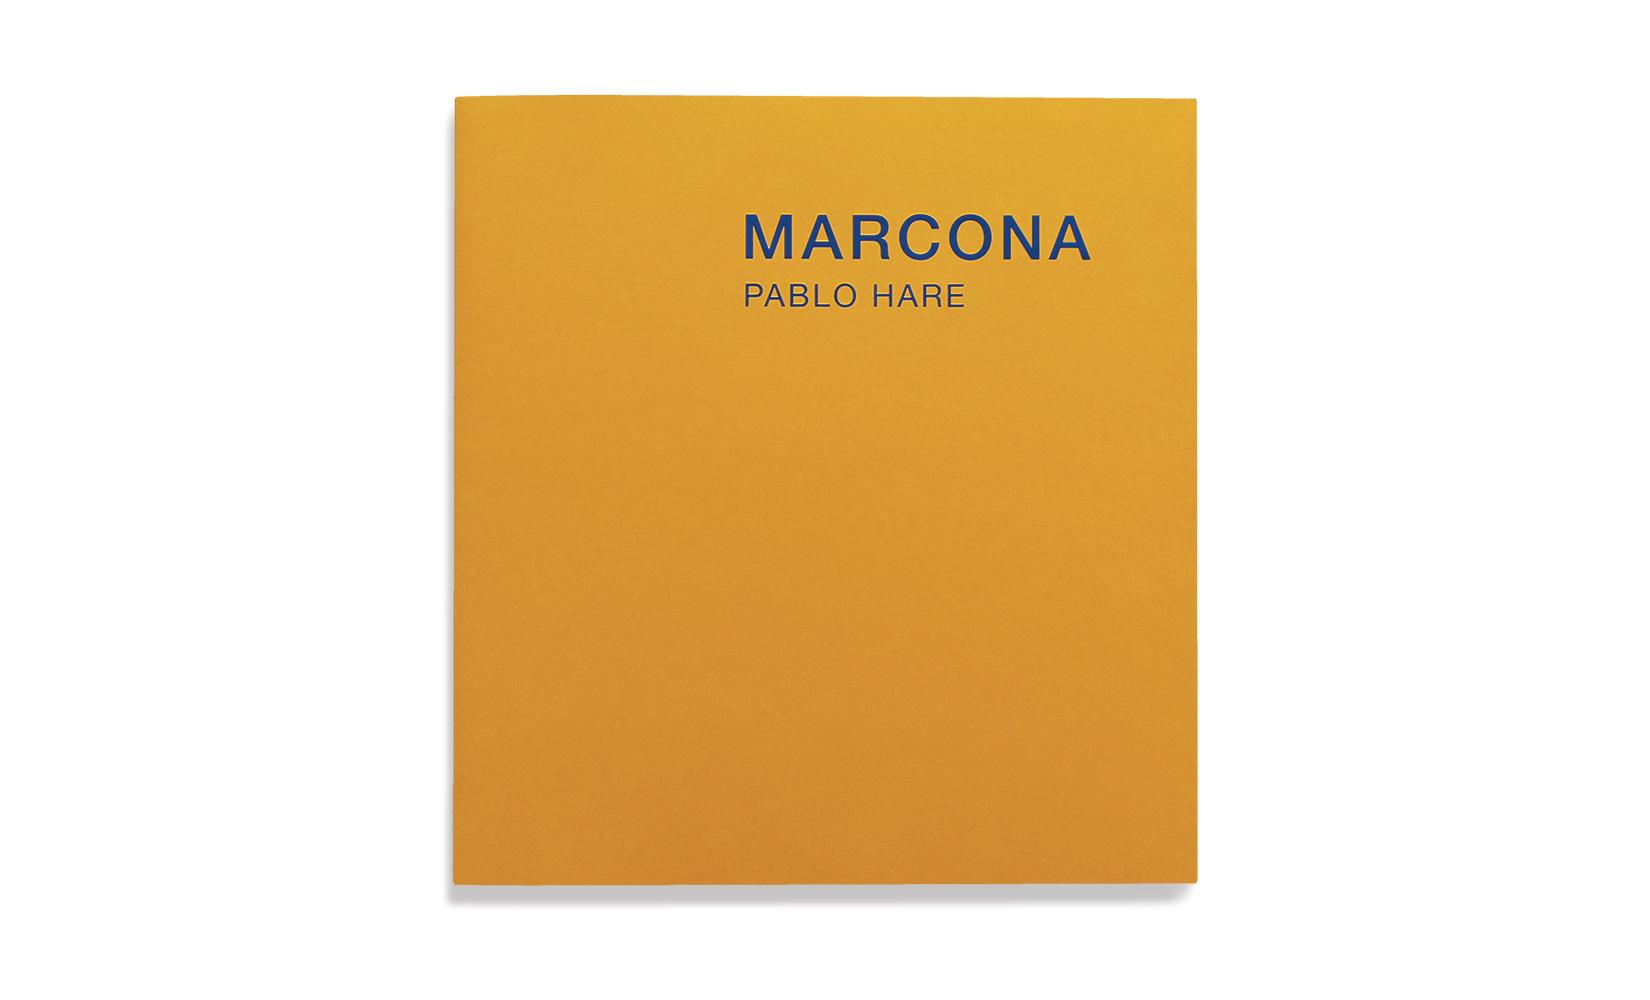 MARCONA-PABLO-HARE-OLIVIER-ANDREOTTI-TOLUCA-STUDIO-01.jpg